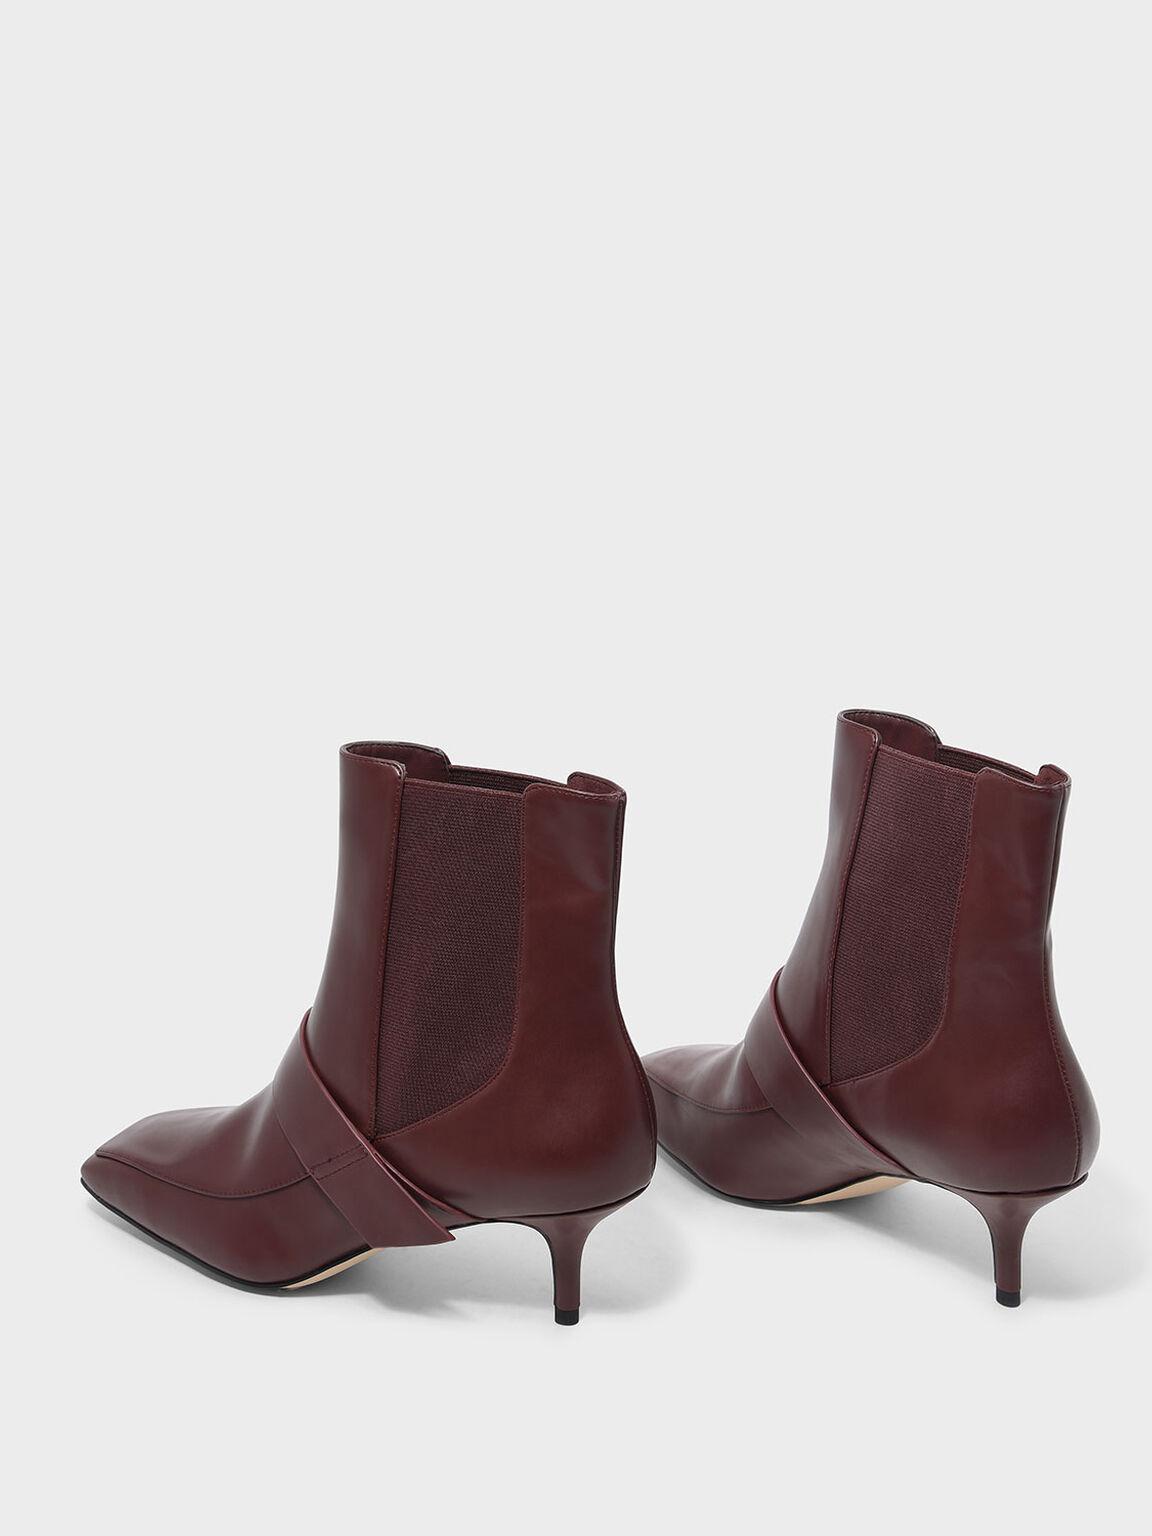 Square Toe Kitten Heel Boots, Burgundy, hi-res